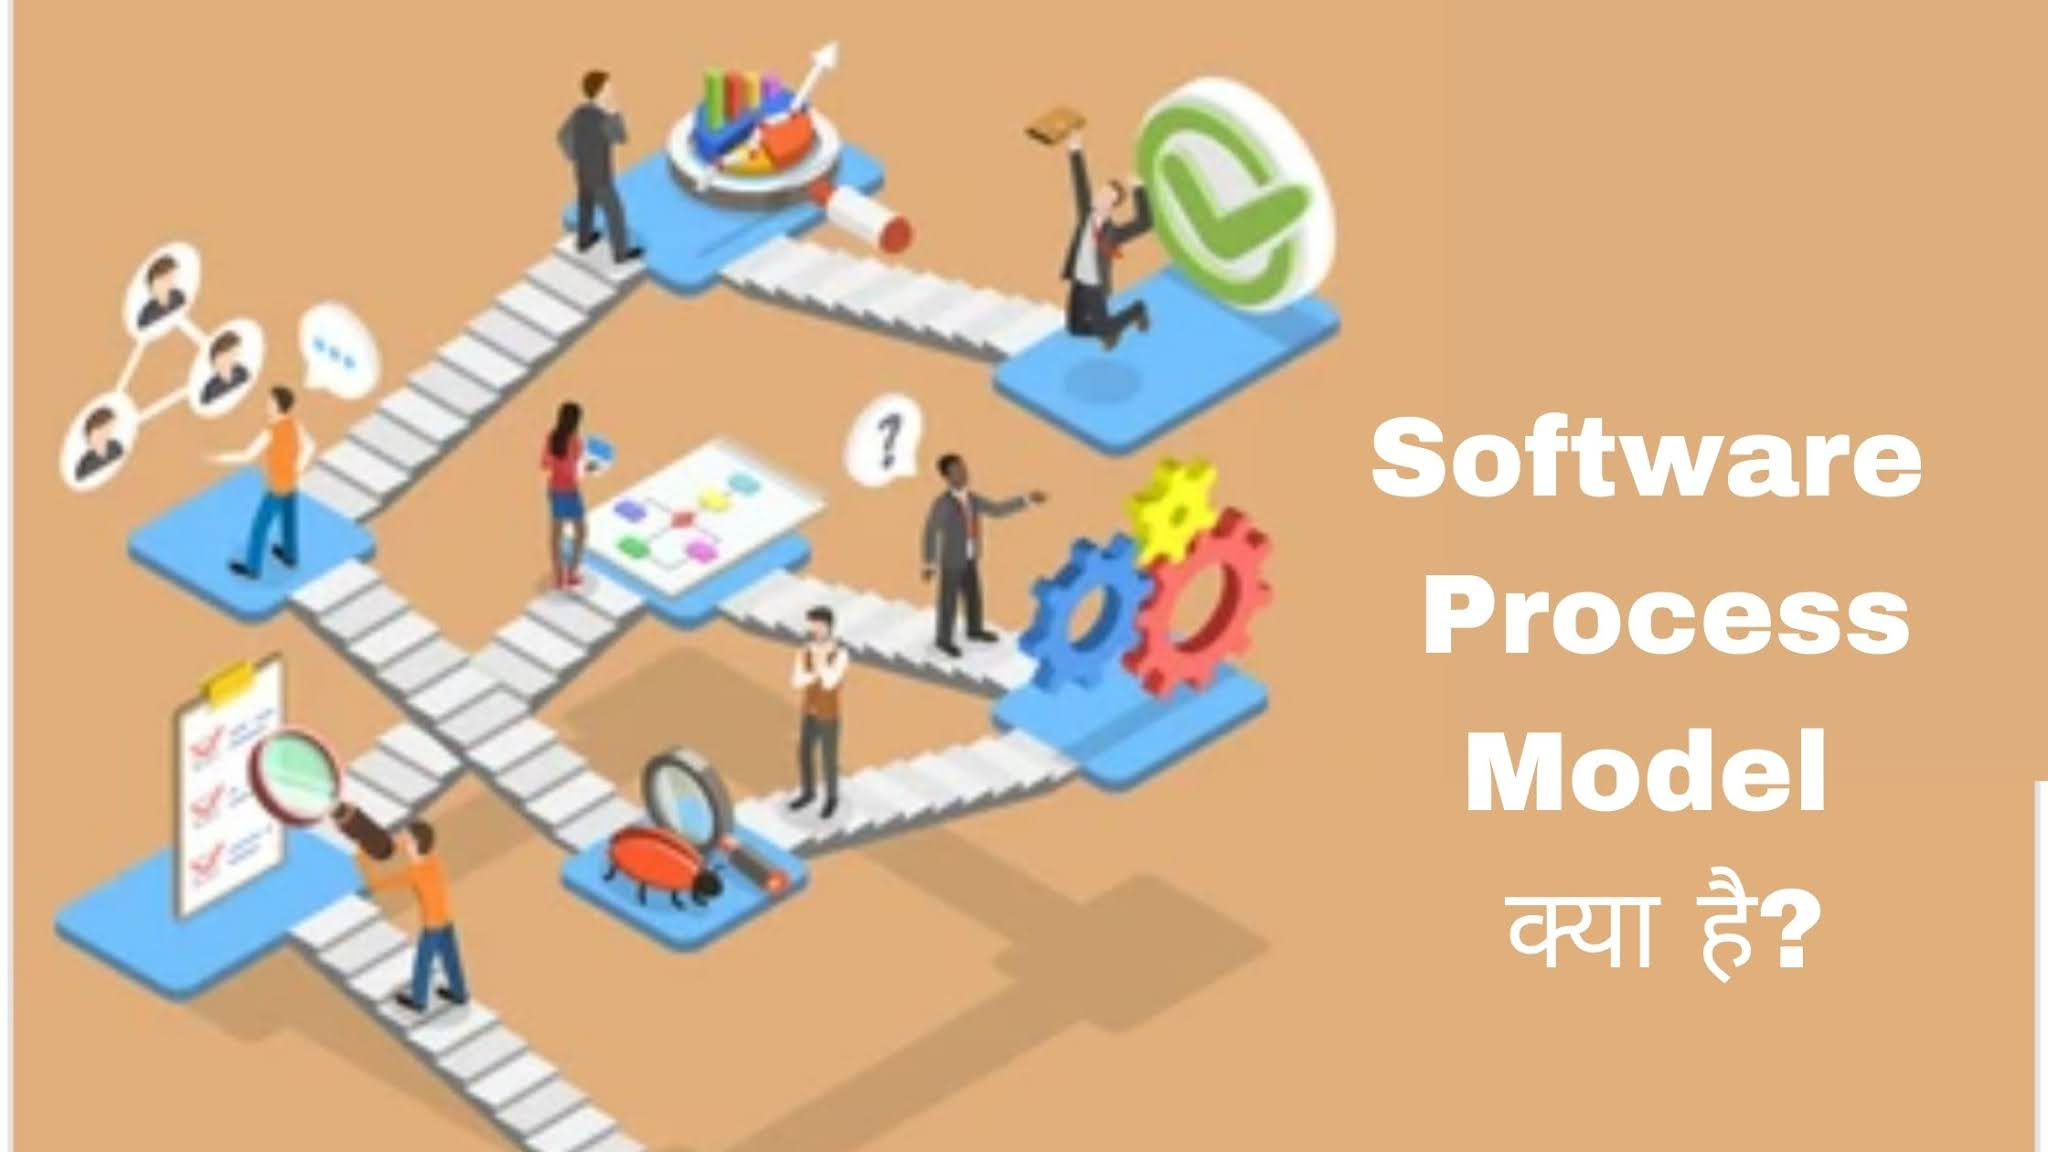 Software Process Model क्या है